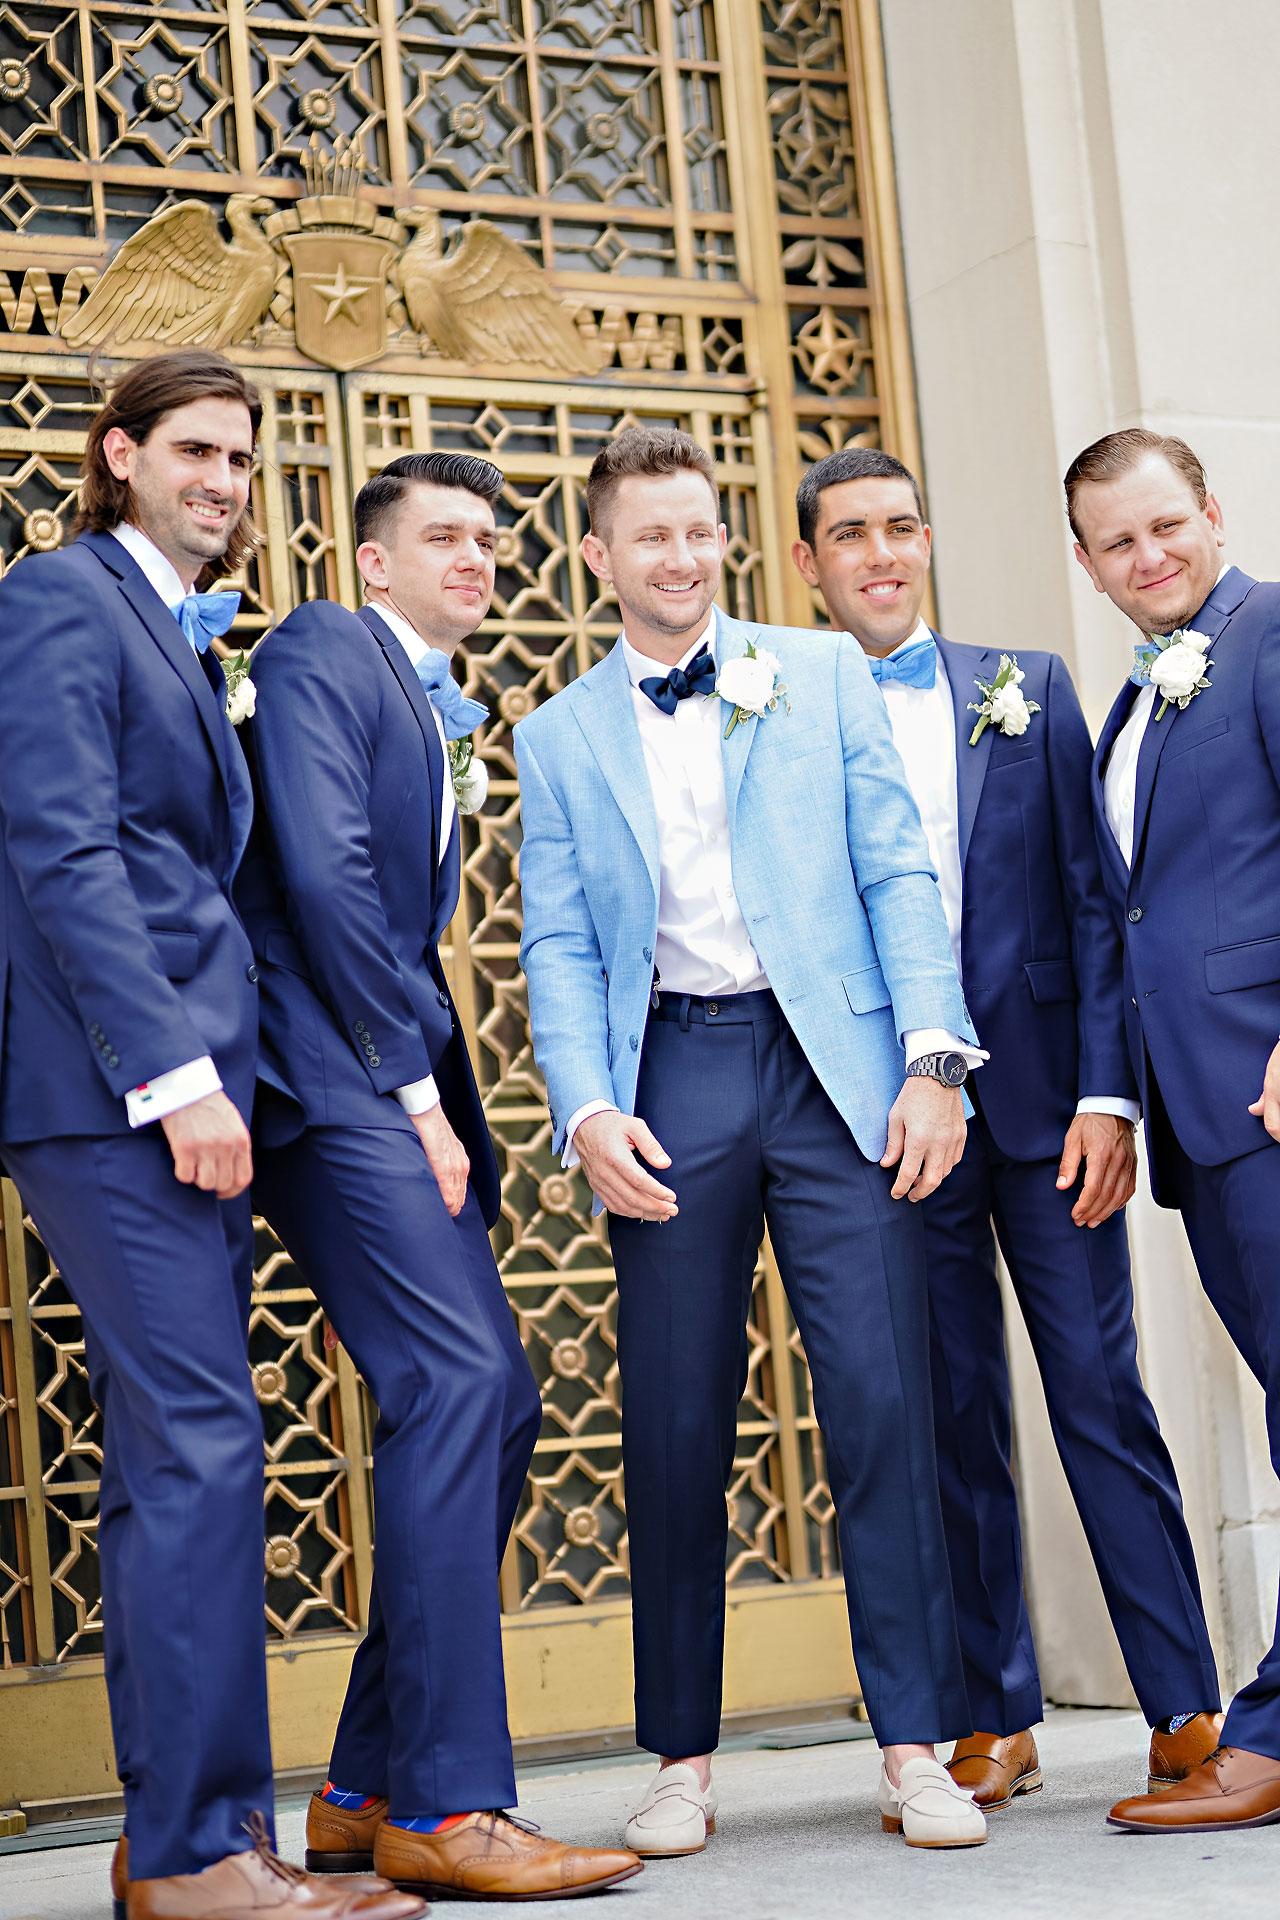 Sammi Jack Regions Tower JPS Events Indianapolis Wedding 076